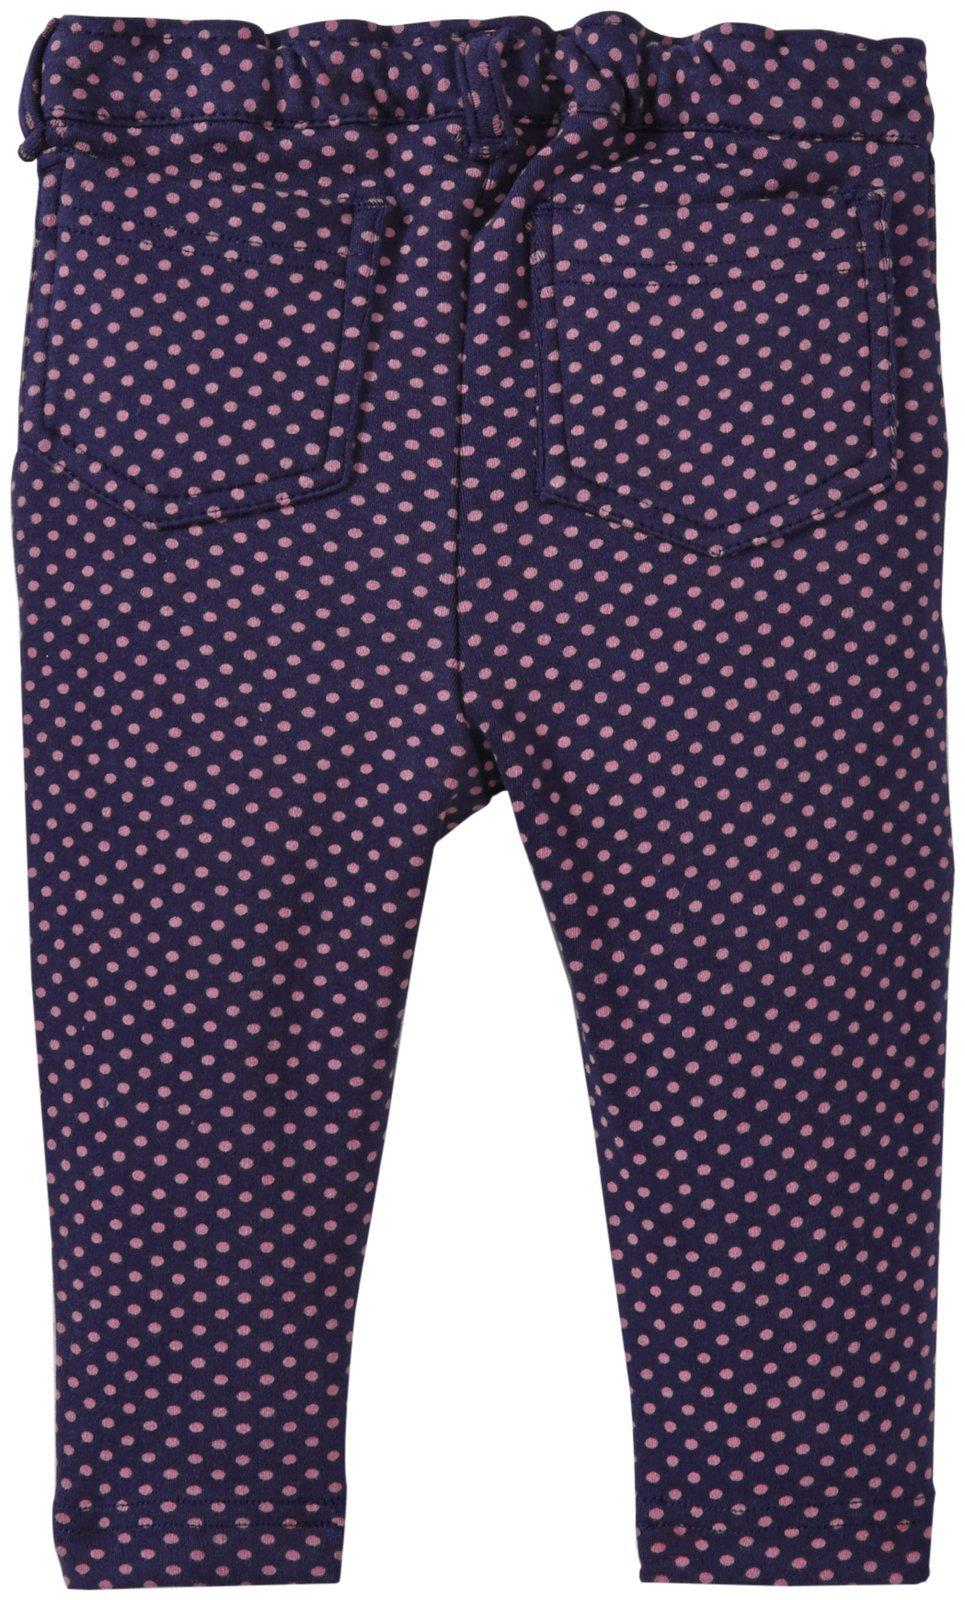 0352f5791bfb2 ... JoJo Maman Bebe Baby Girls  Dot Jersey Jeans - Navy Fuchsia - 6- ...